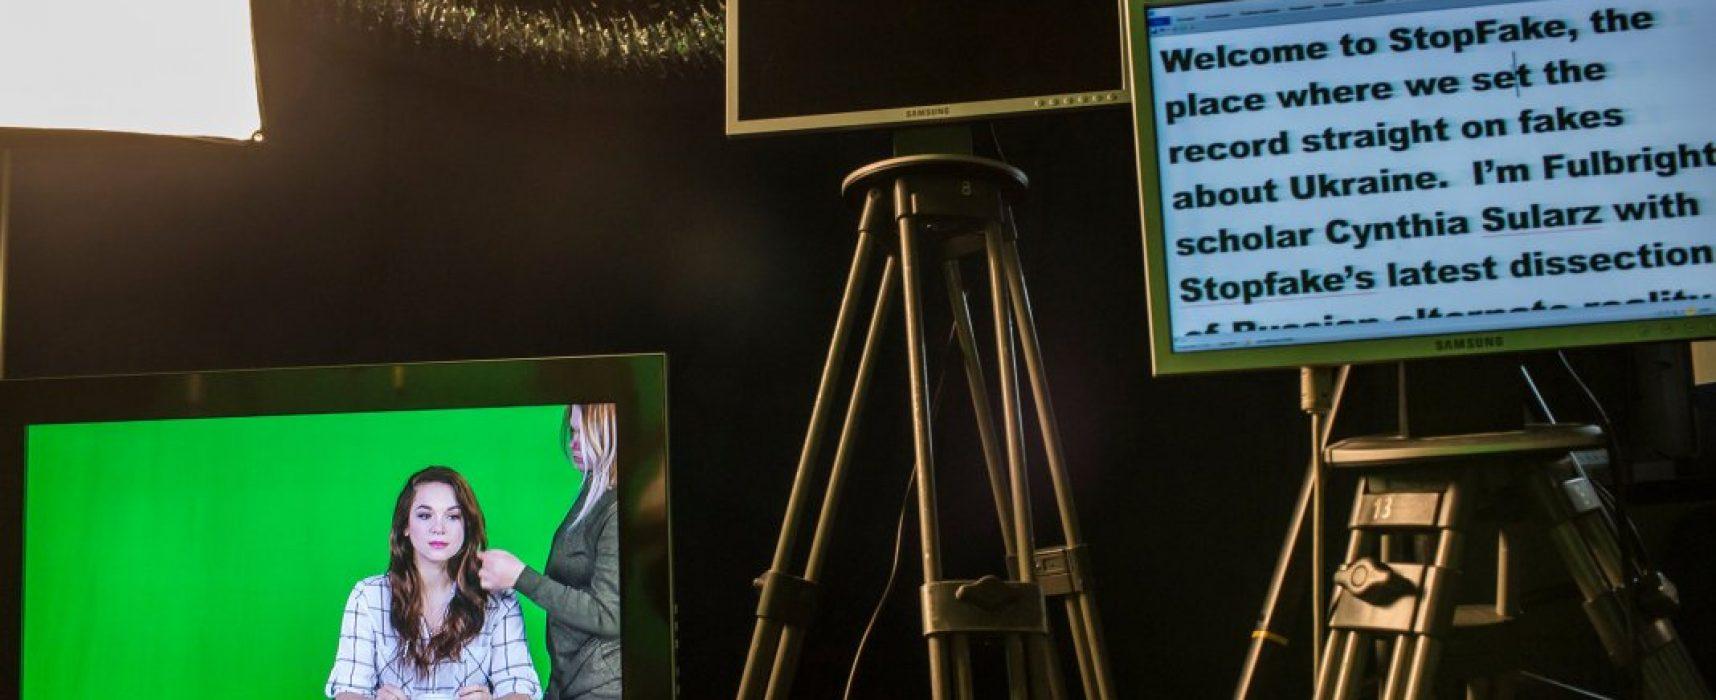 Diario de Kyiv: Para luchar contra las noticias falsas, ucraniano Show Features Nothing but Lies